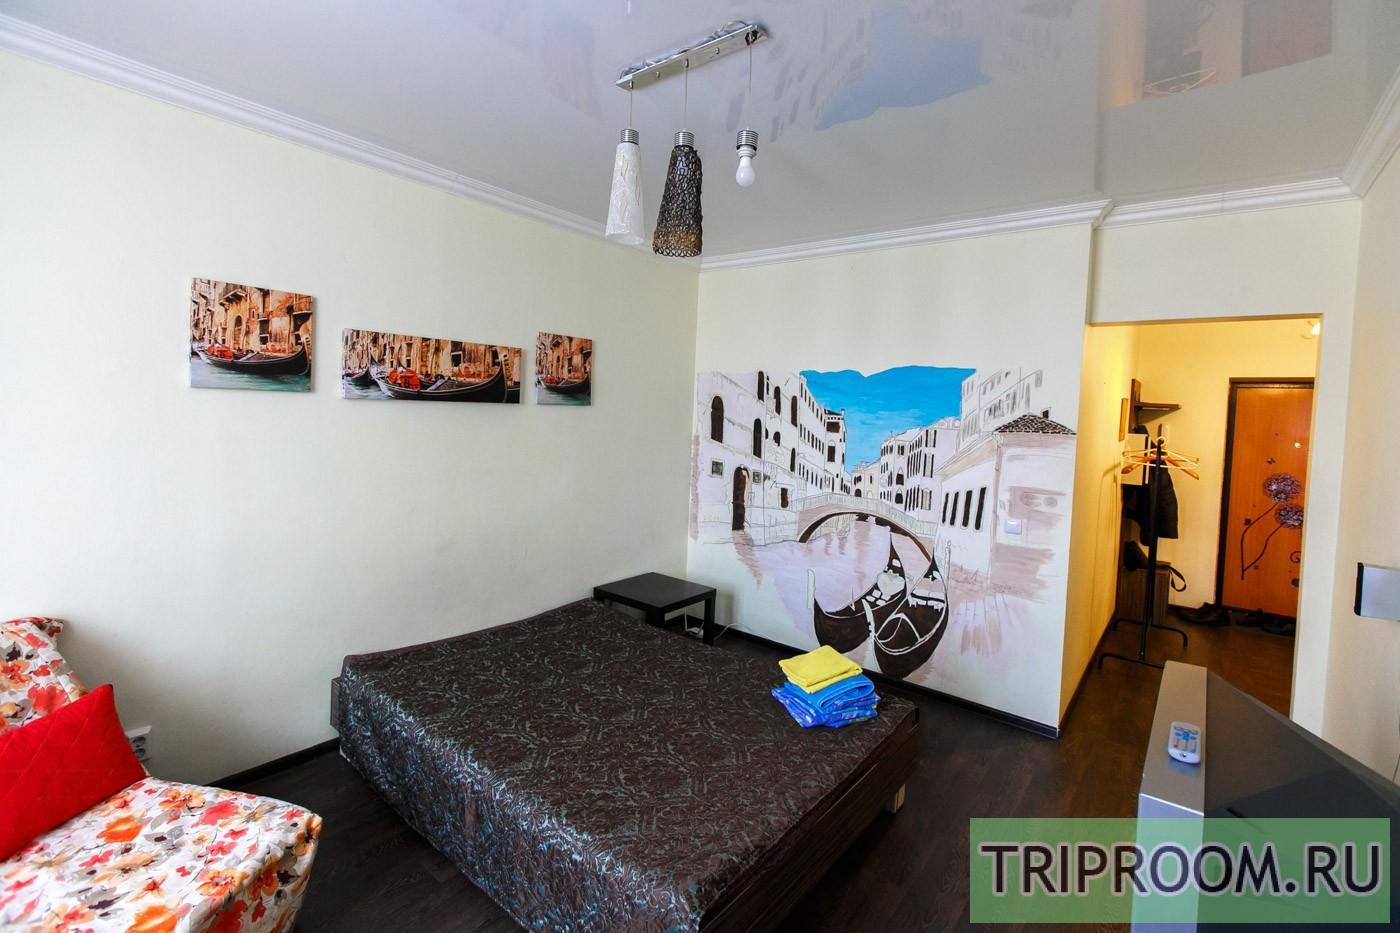 1-комнатная квартира посуточно (вариант № 28539), ул. П.И. Смородина, фото № 4